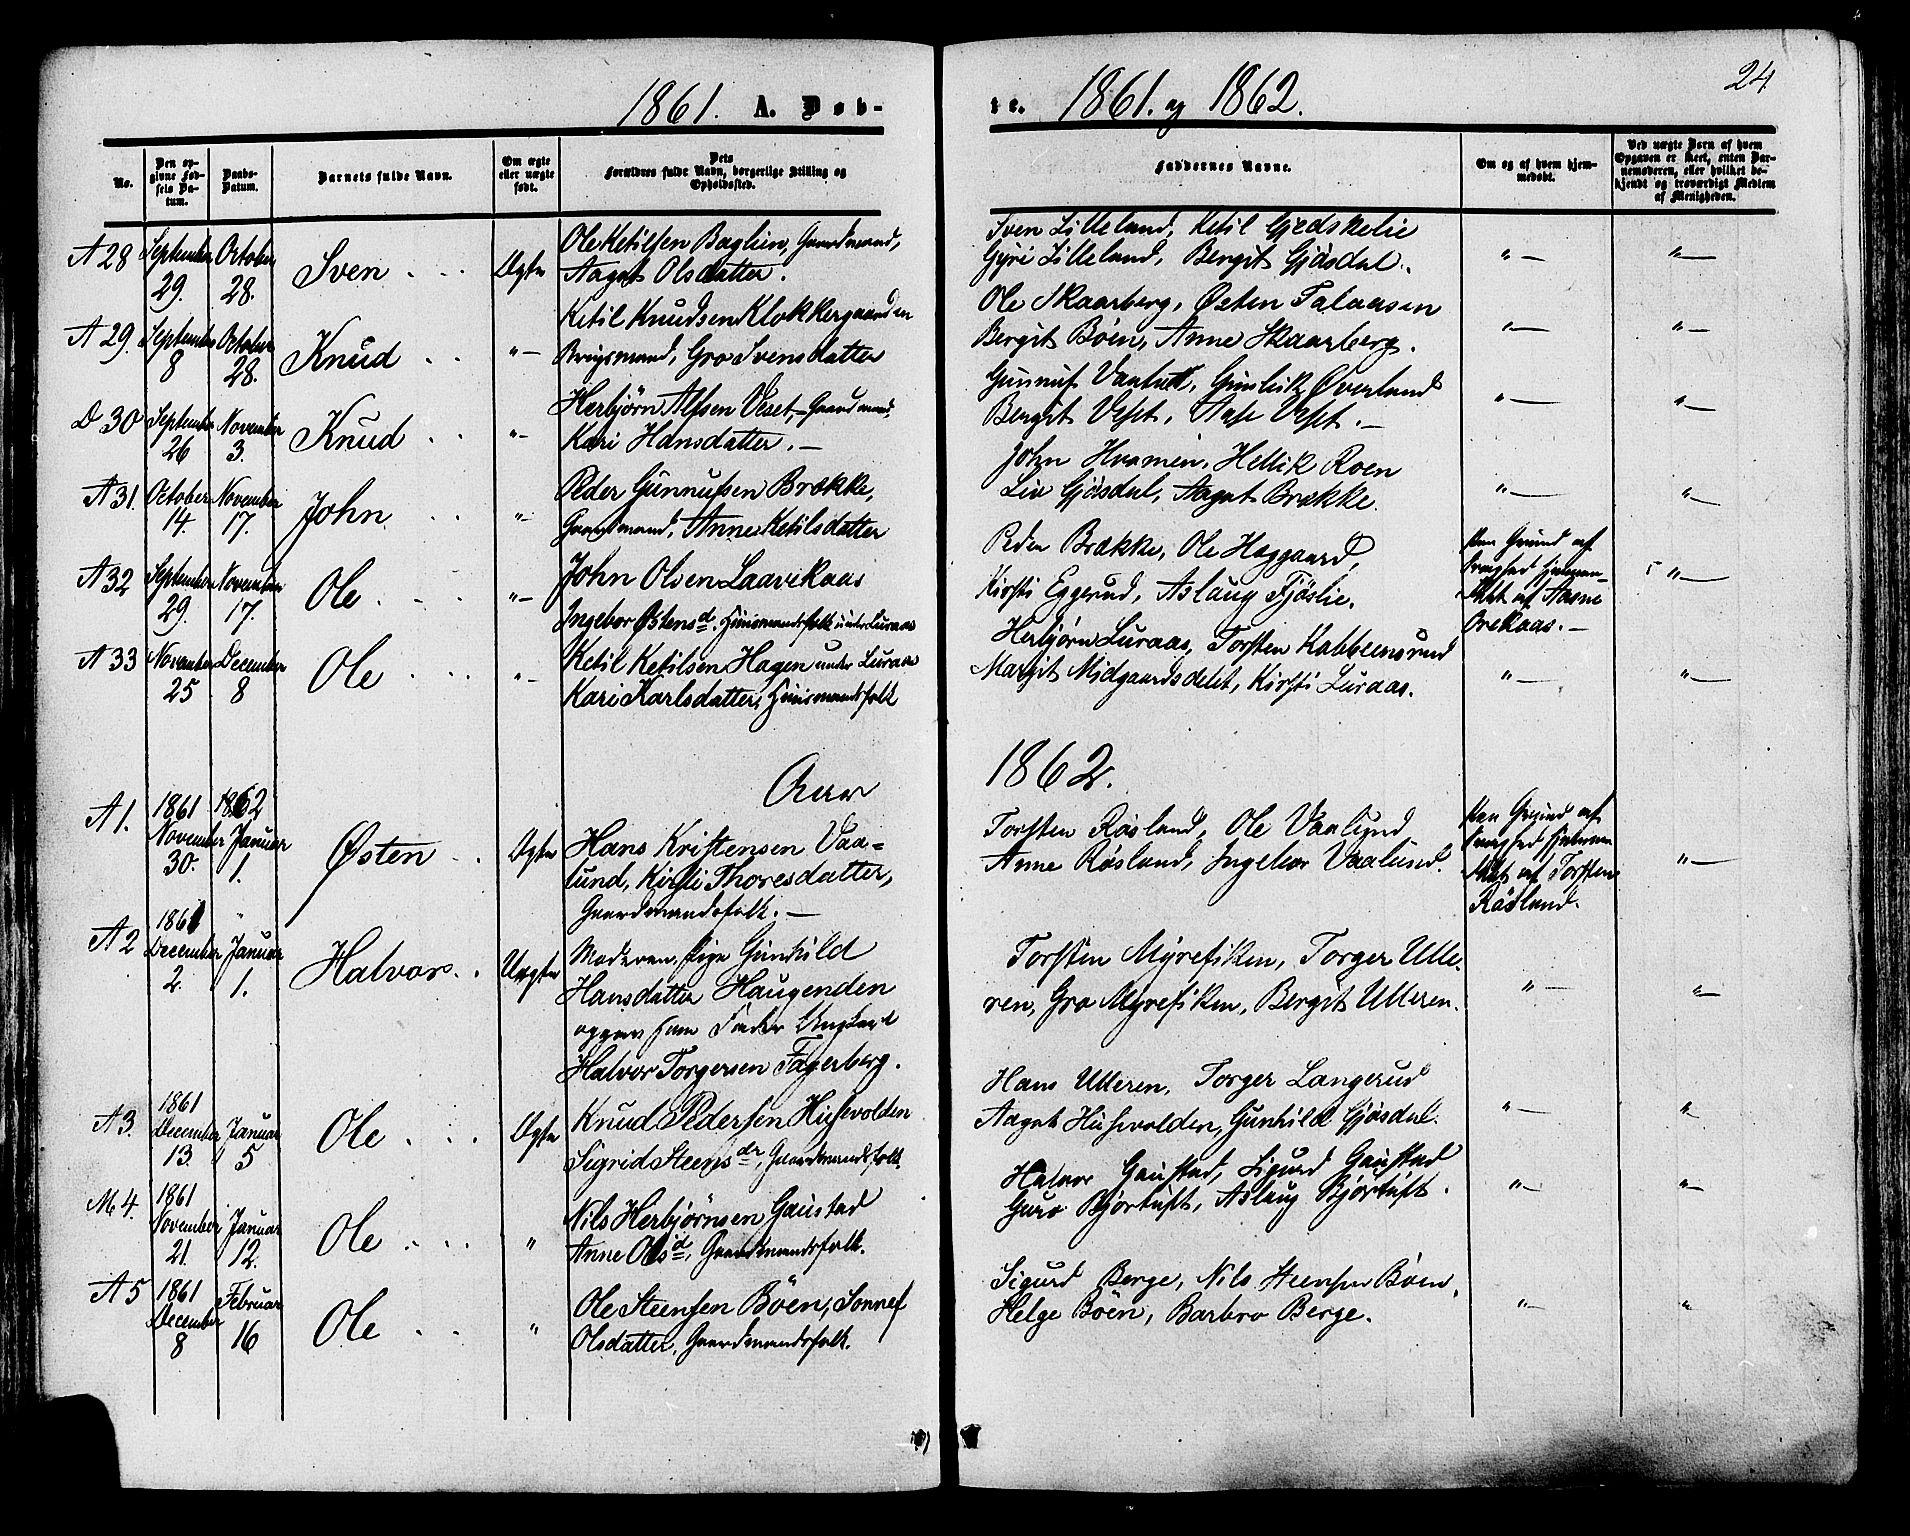 SAKO, Tinn kirkebøker, F/Fa/L0006: Ministerialbok nr. I 6, 1857-1878, s. 24